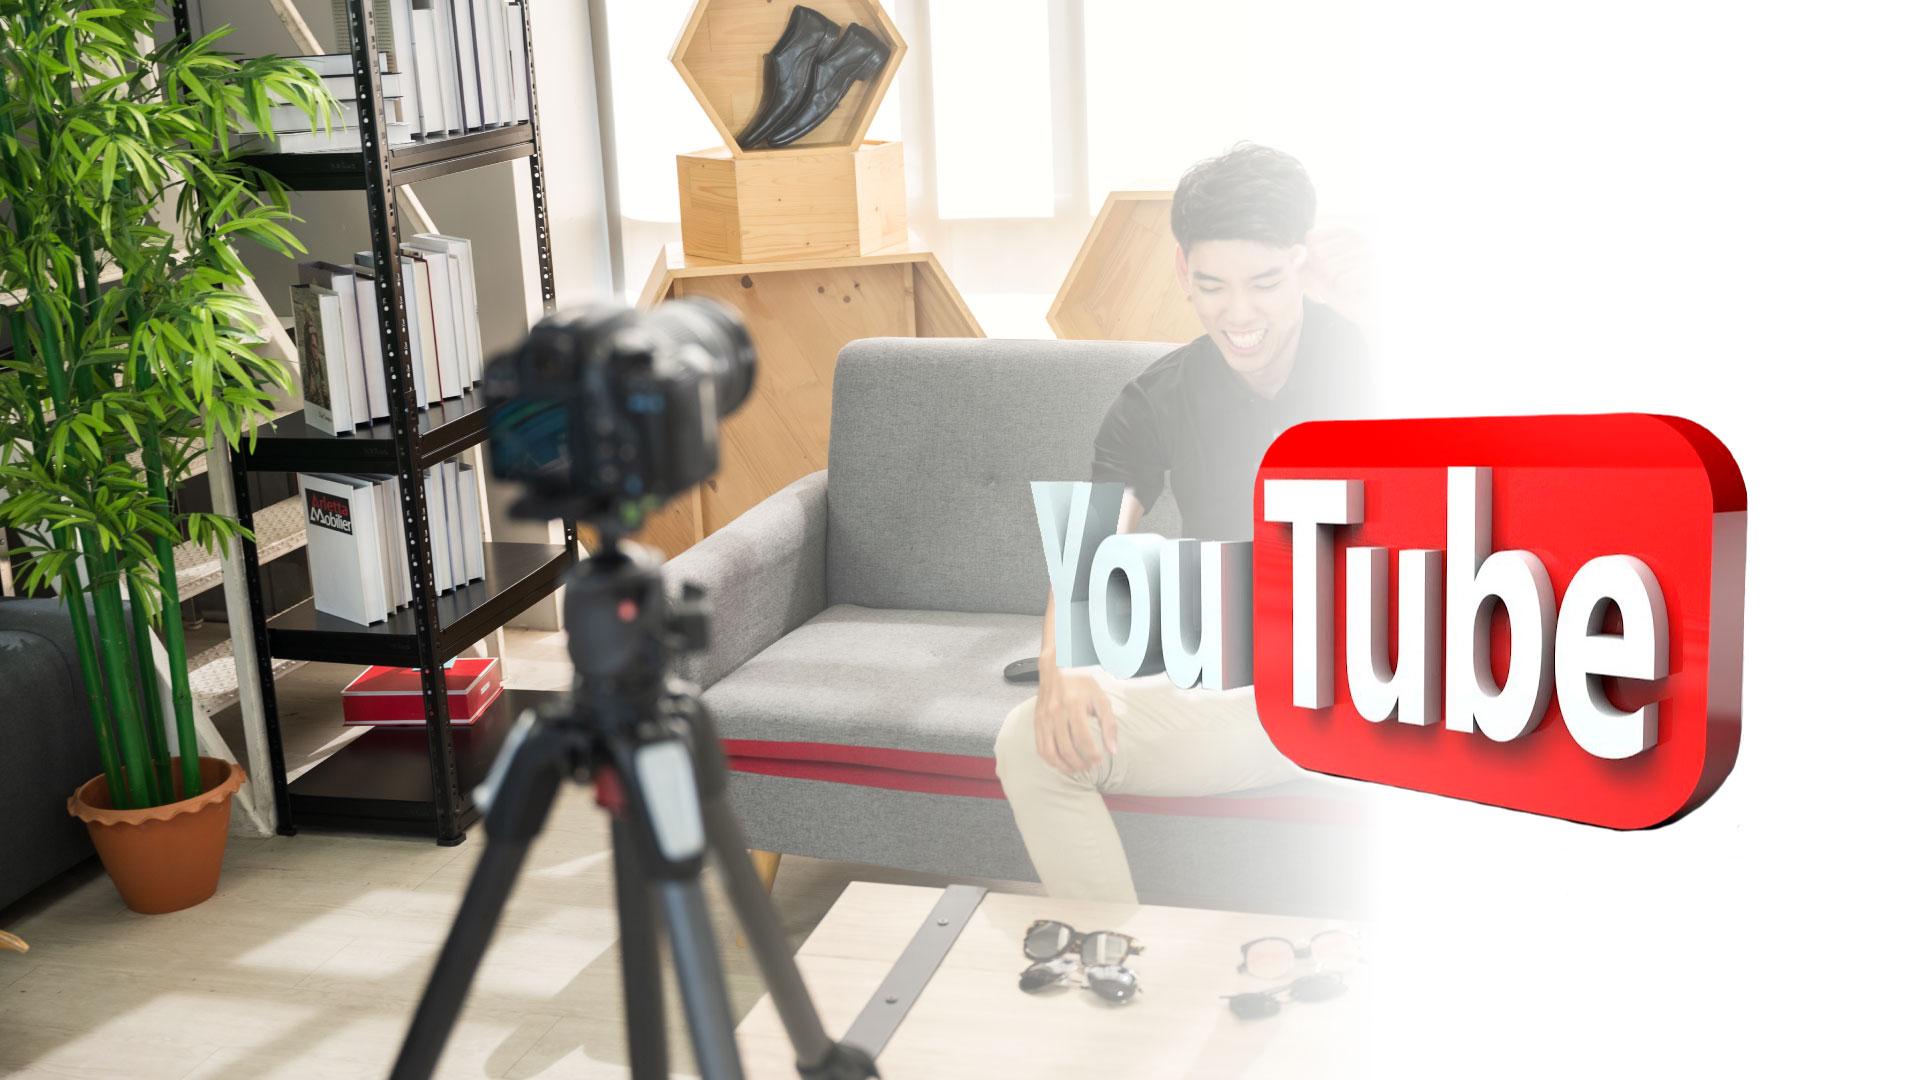 YoutubeRey2